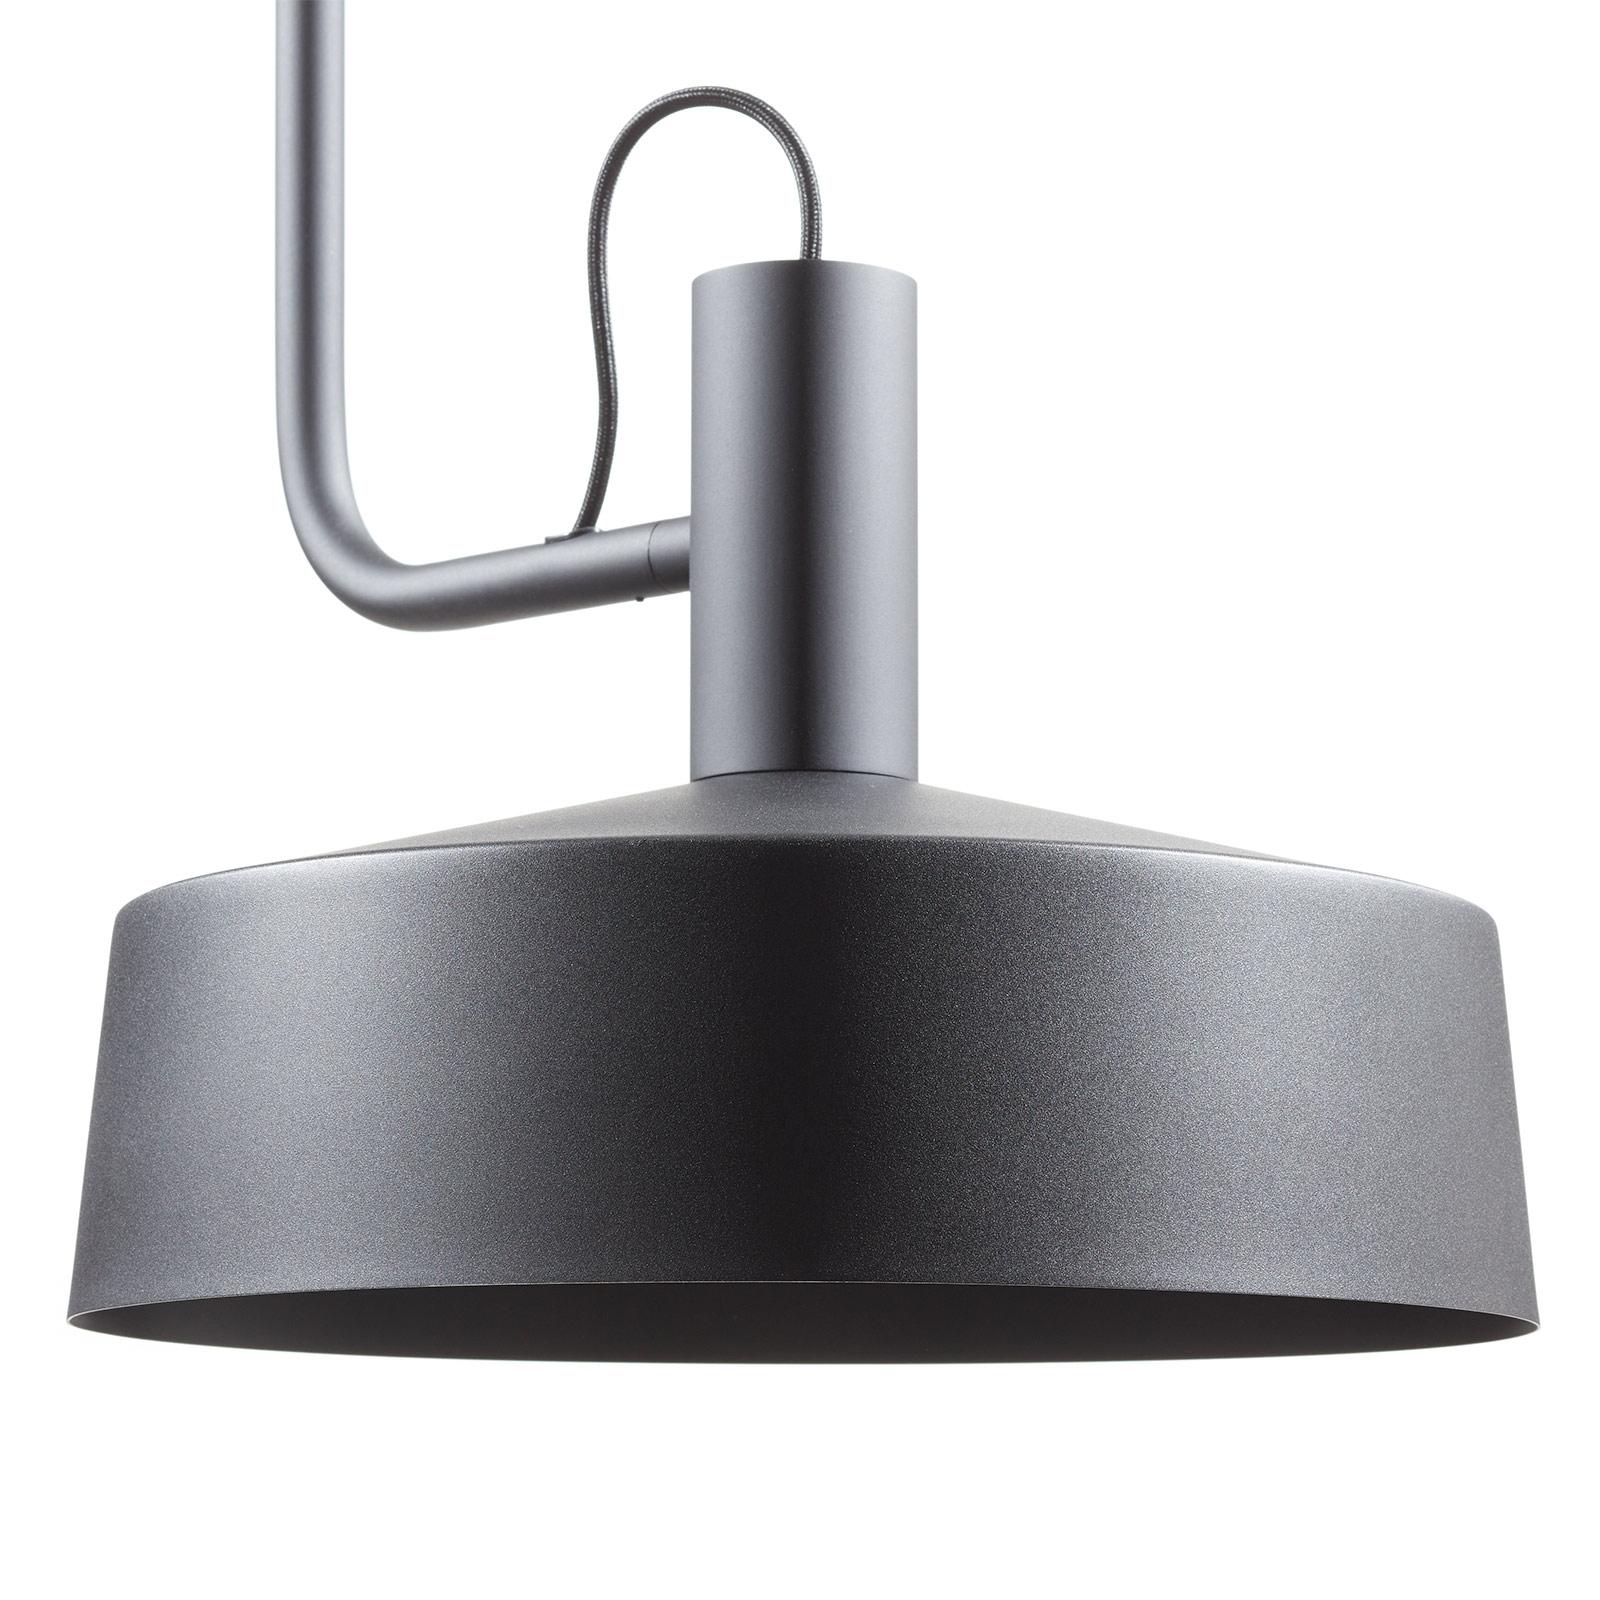 WEVER & DUCRÉ Roomor Hänge GU10 1fl 40,5cm schwarz